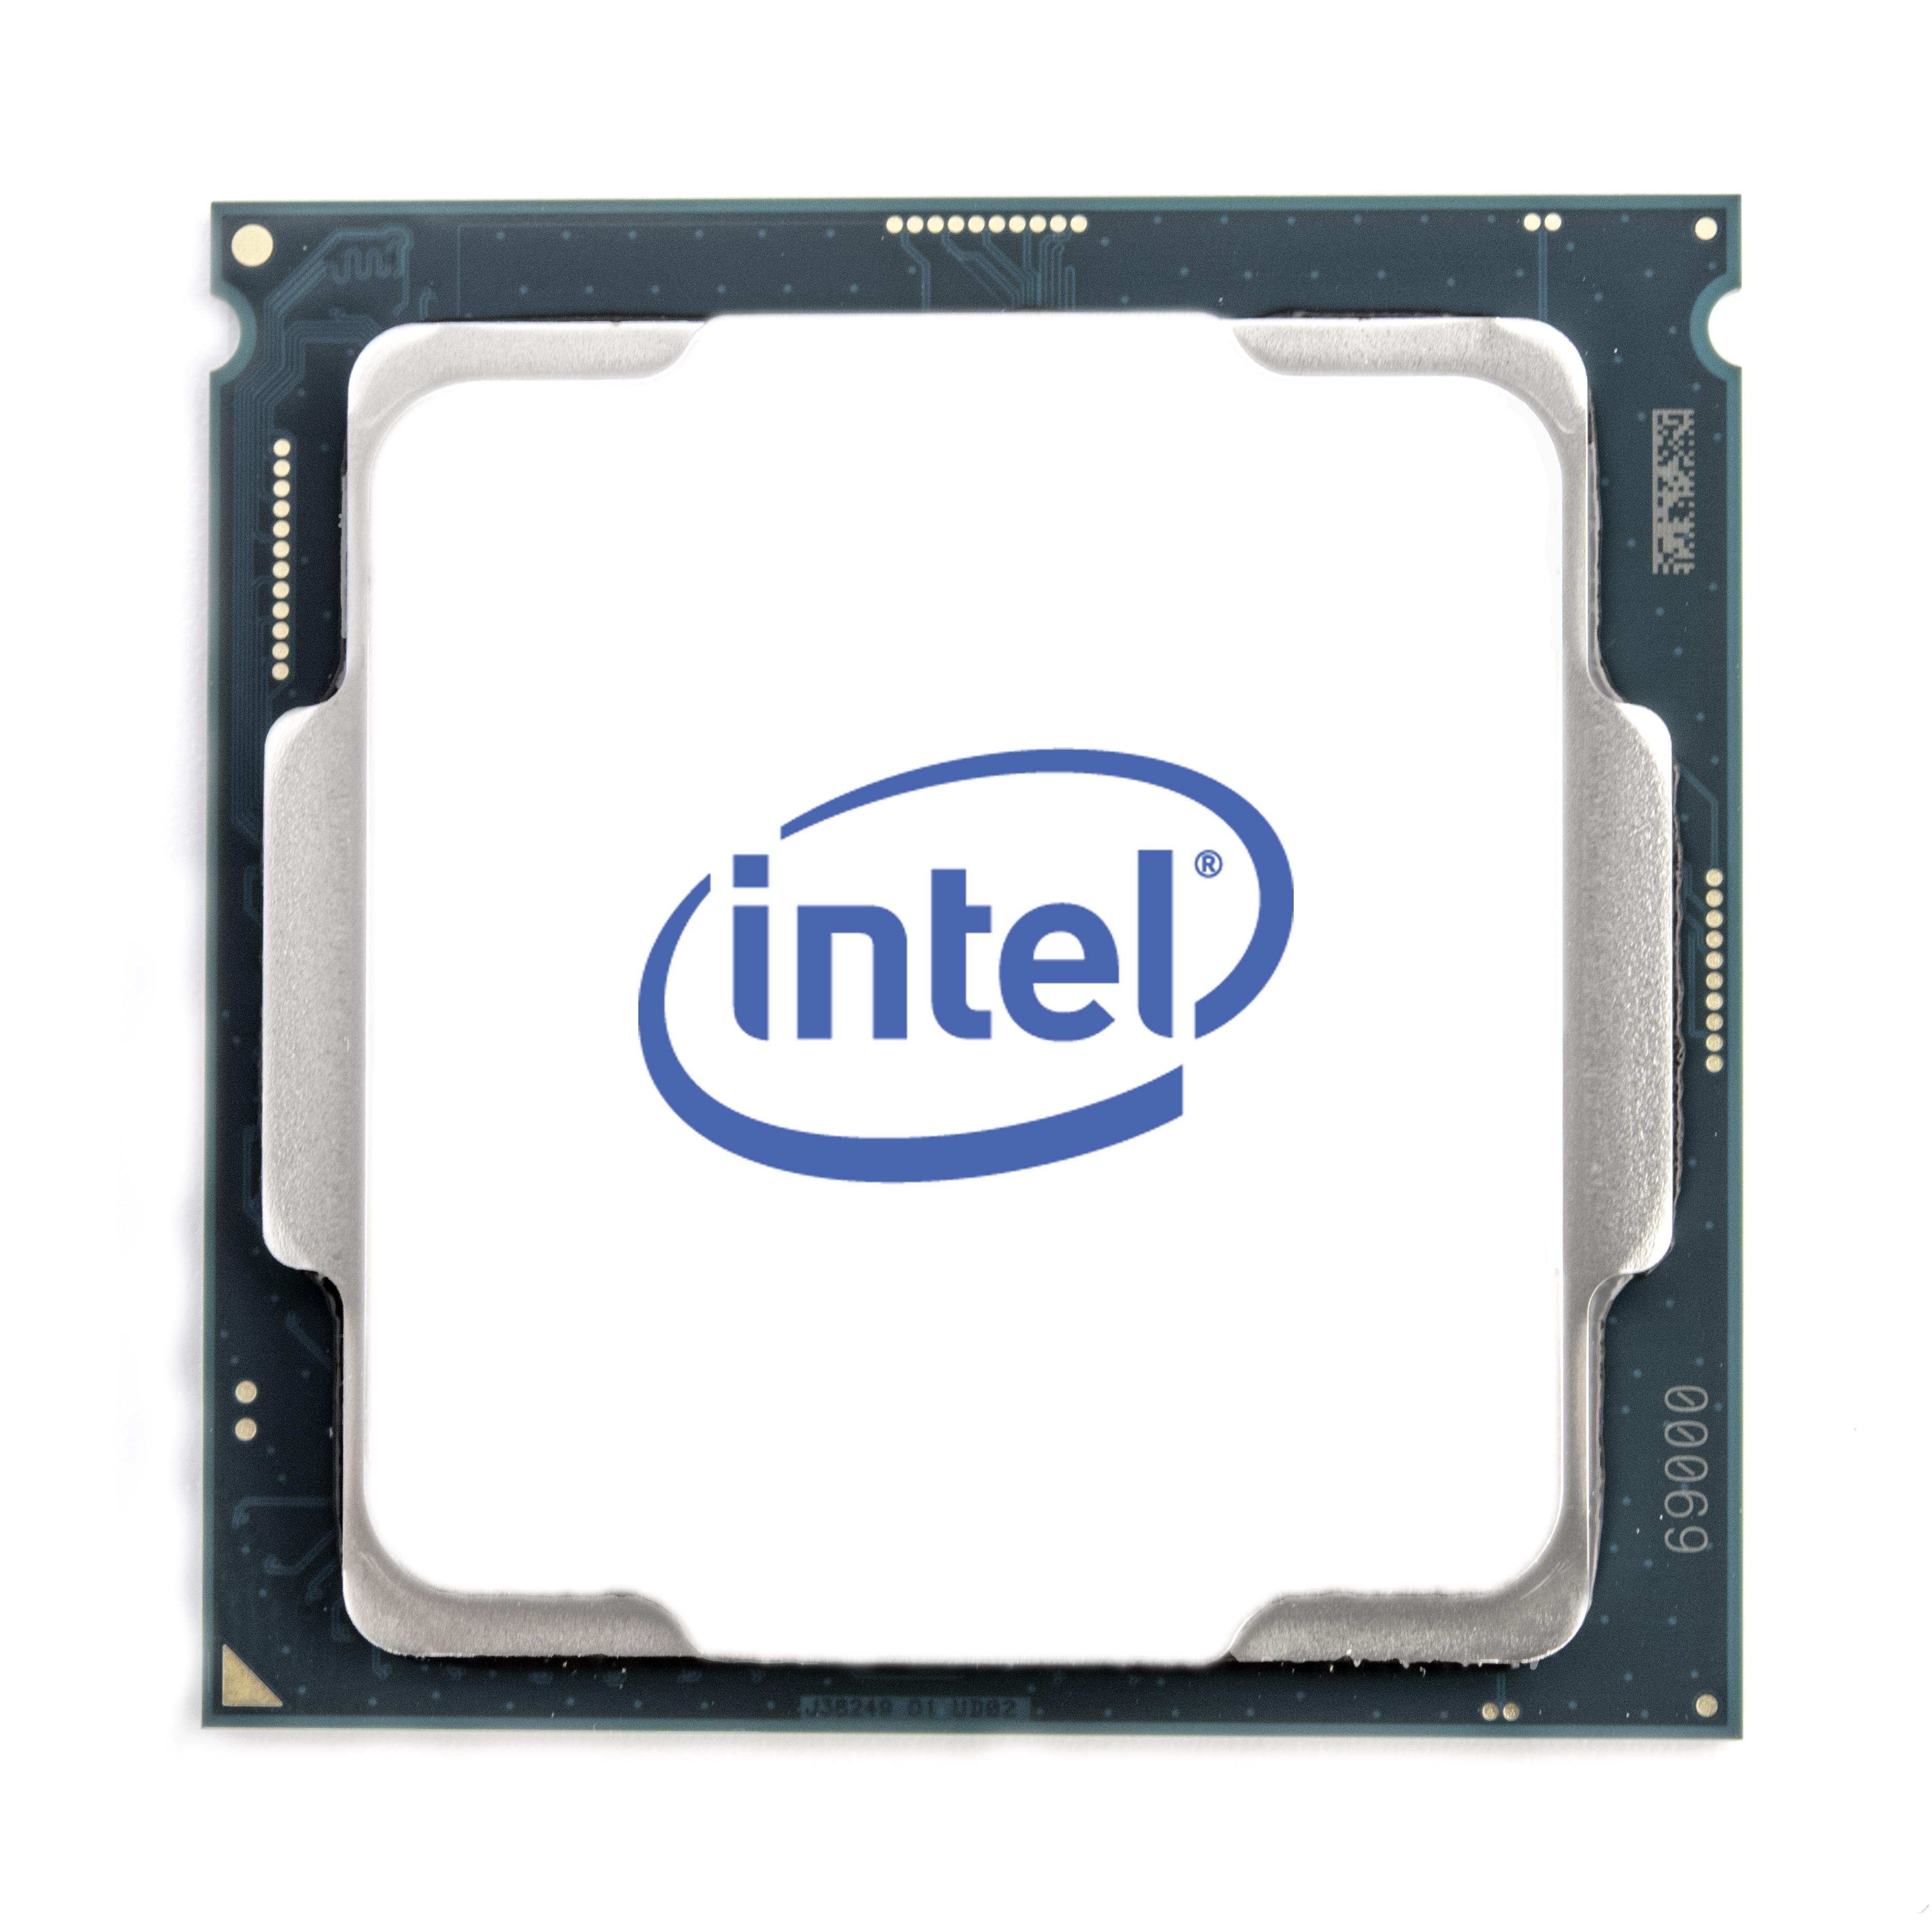 Intel Core ®  i7-8700K Processor (12M Cache - up to 4.70 GHz) 3.70GHz 12MB Smart Cache Prozessor